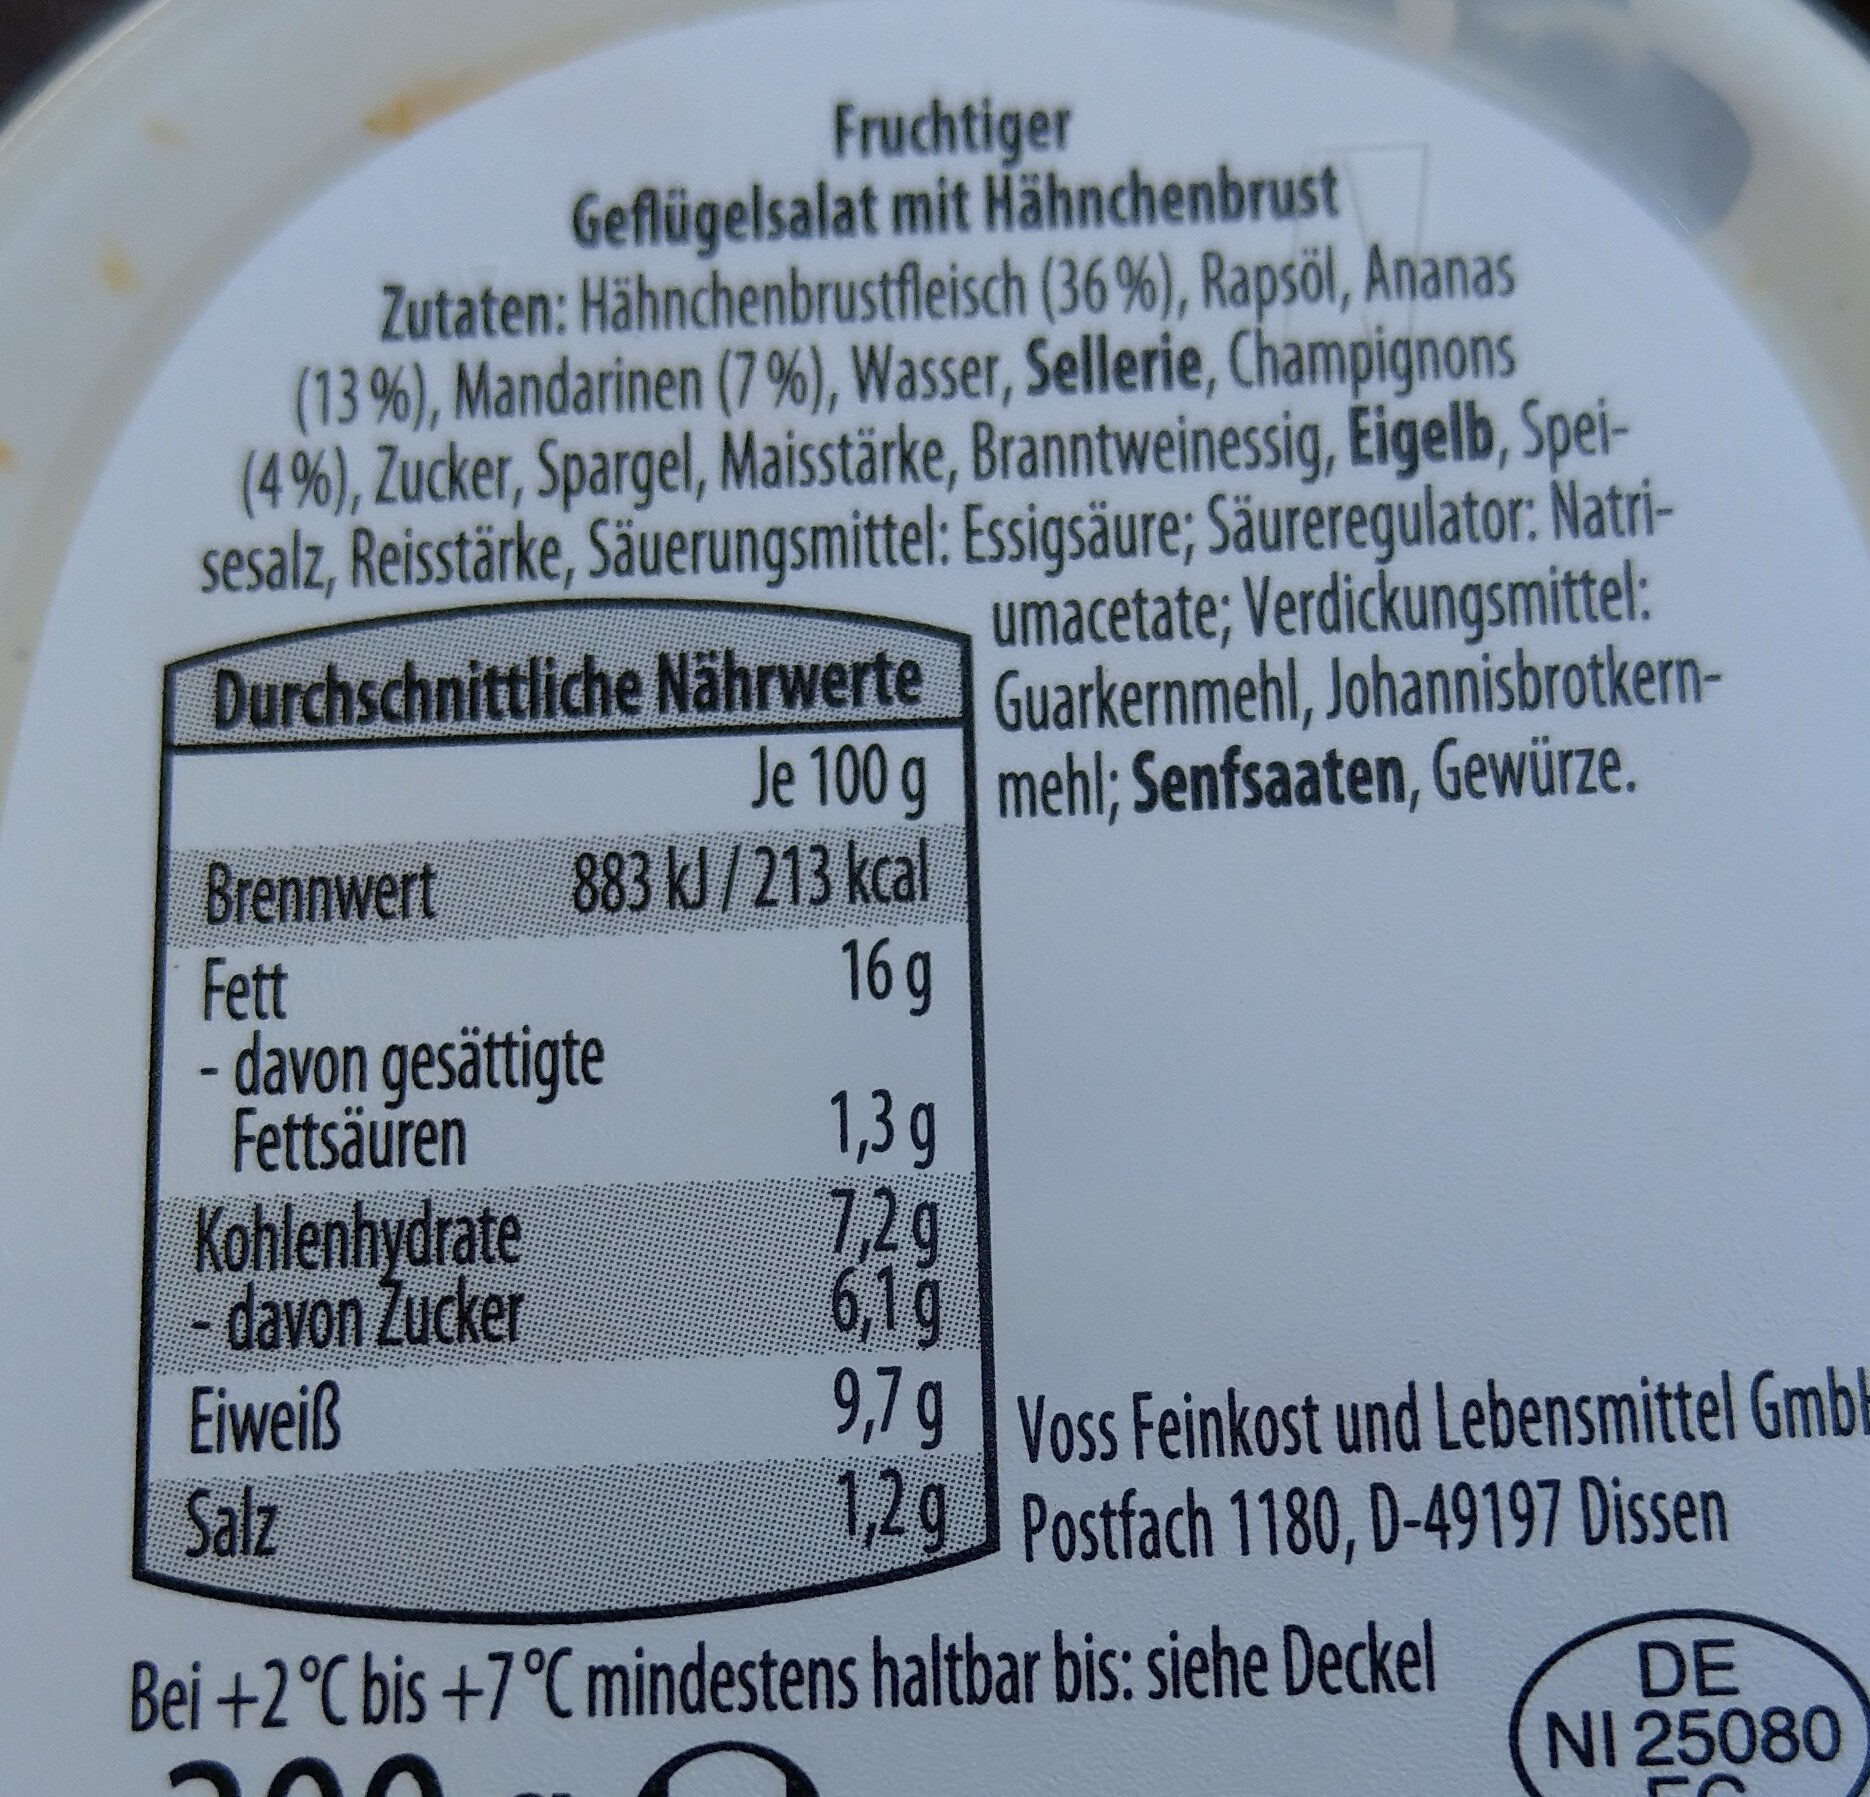 Geflügelsalat - Ingrédients - de